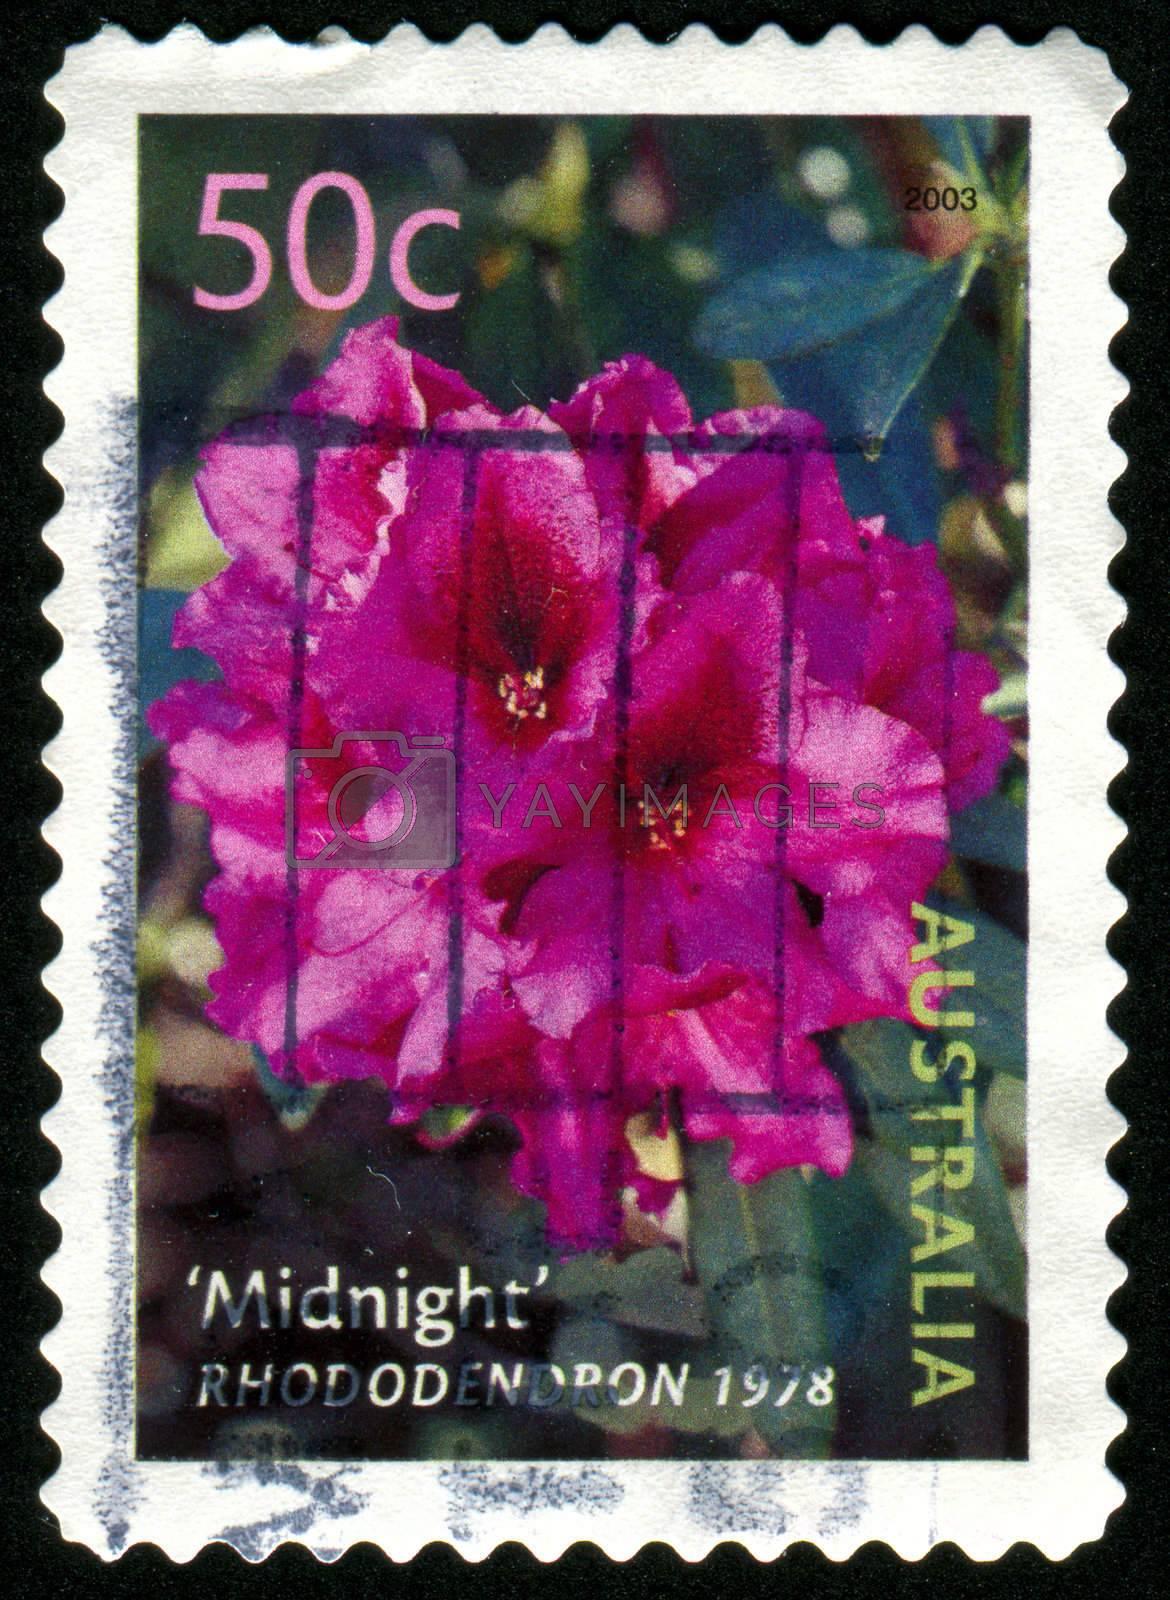 AUSTRALIA - CIRCA 2003: stamp printed by Australia, shows Midnight rhododendron, circa 2003